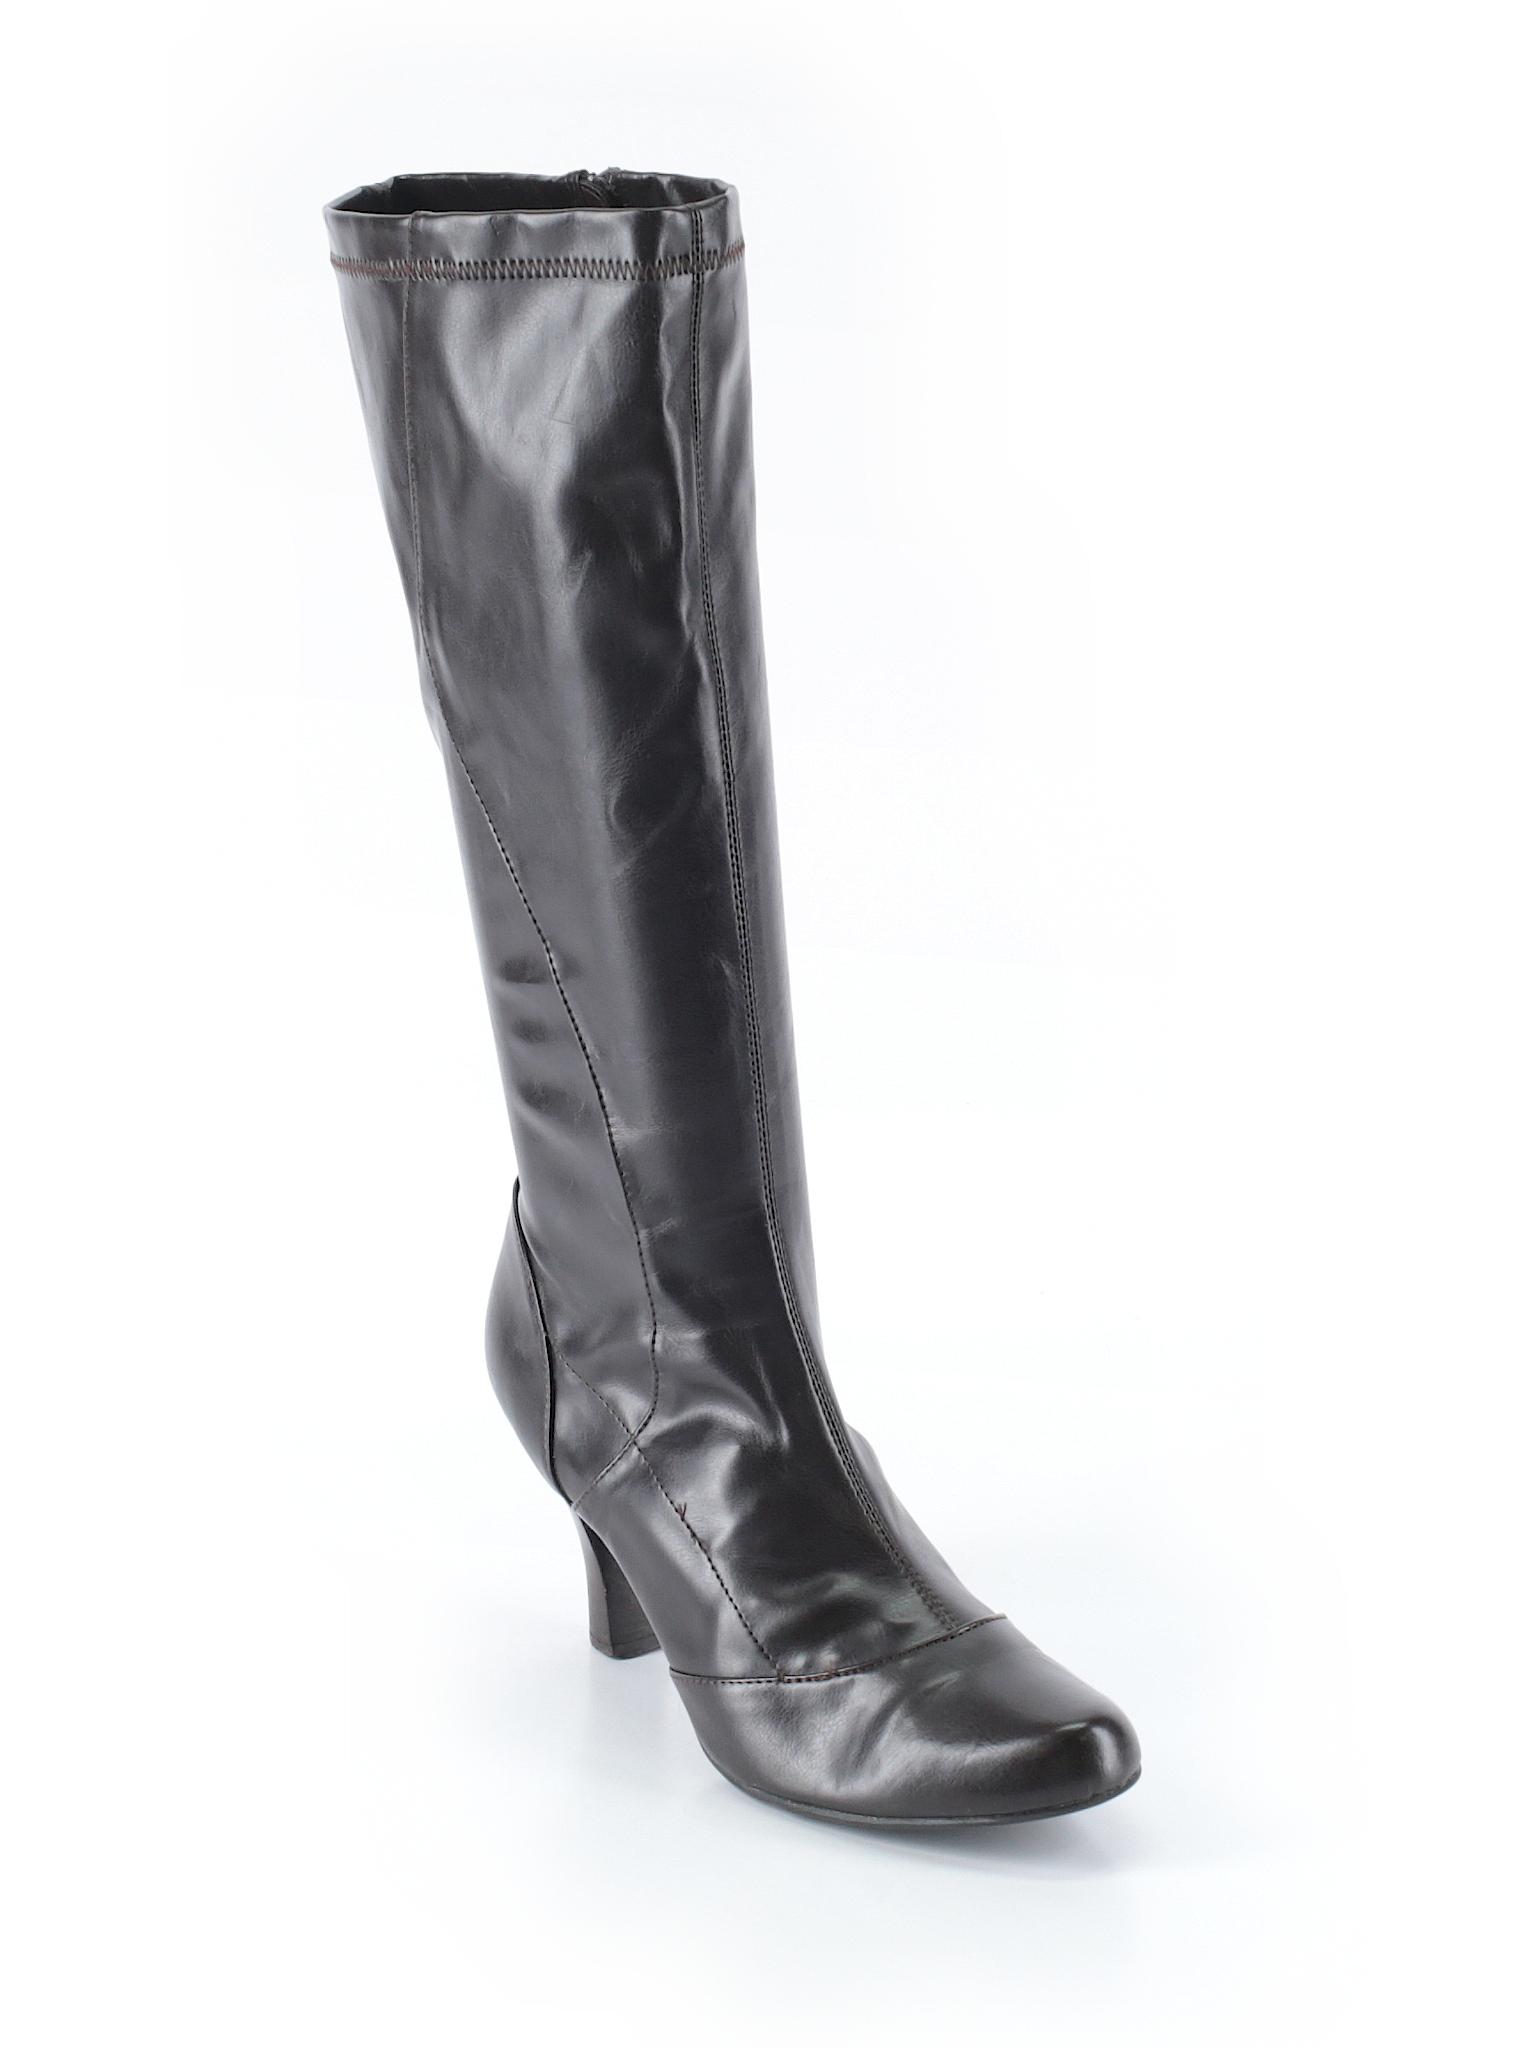 REACTION Boots Boutique promotion Cole Kenneth XwqIxftxWY